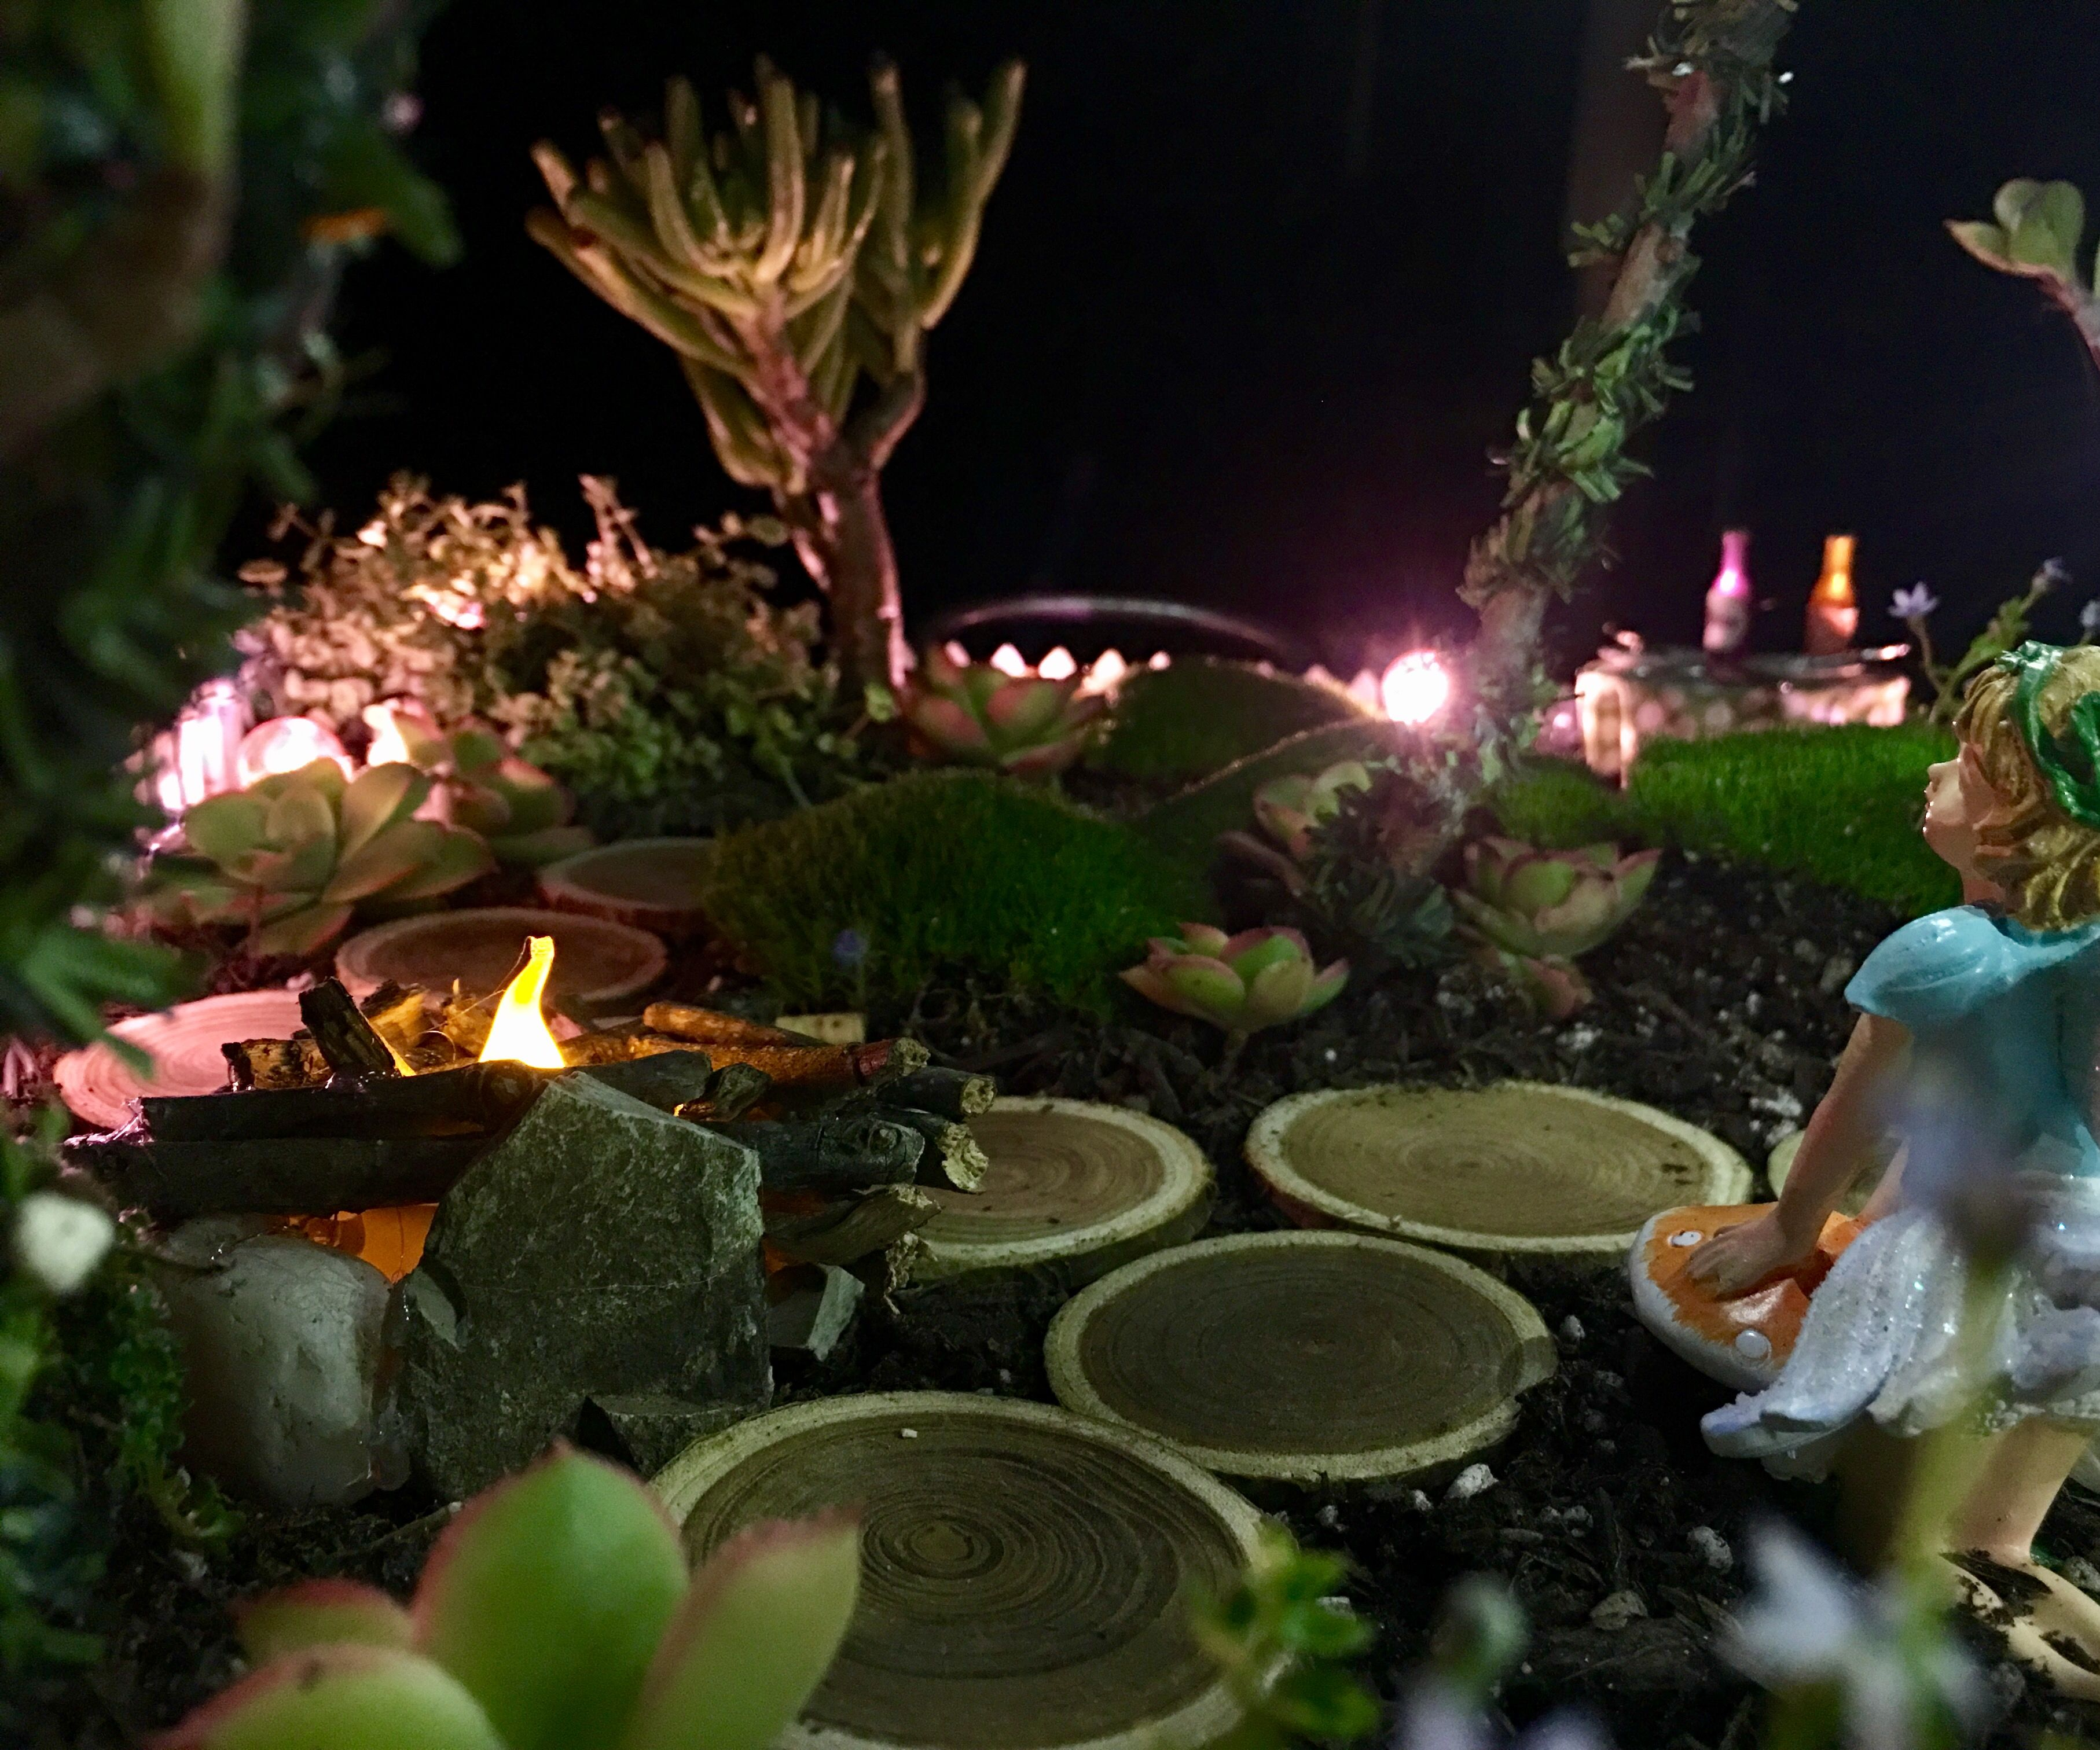 a Magical Lighted Fairy Garden!